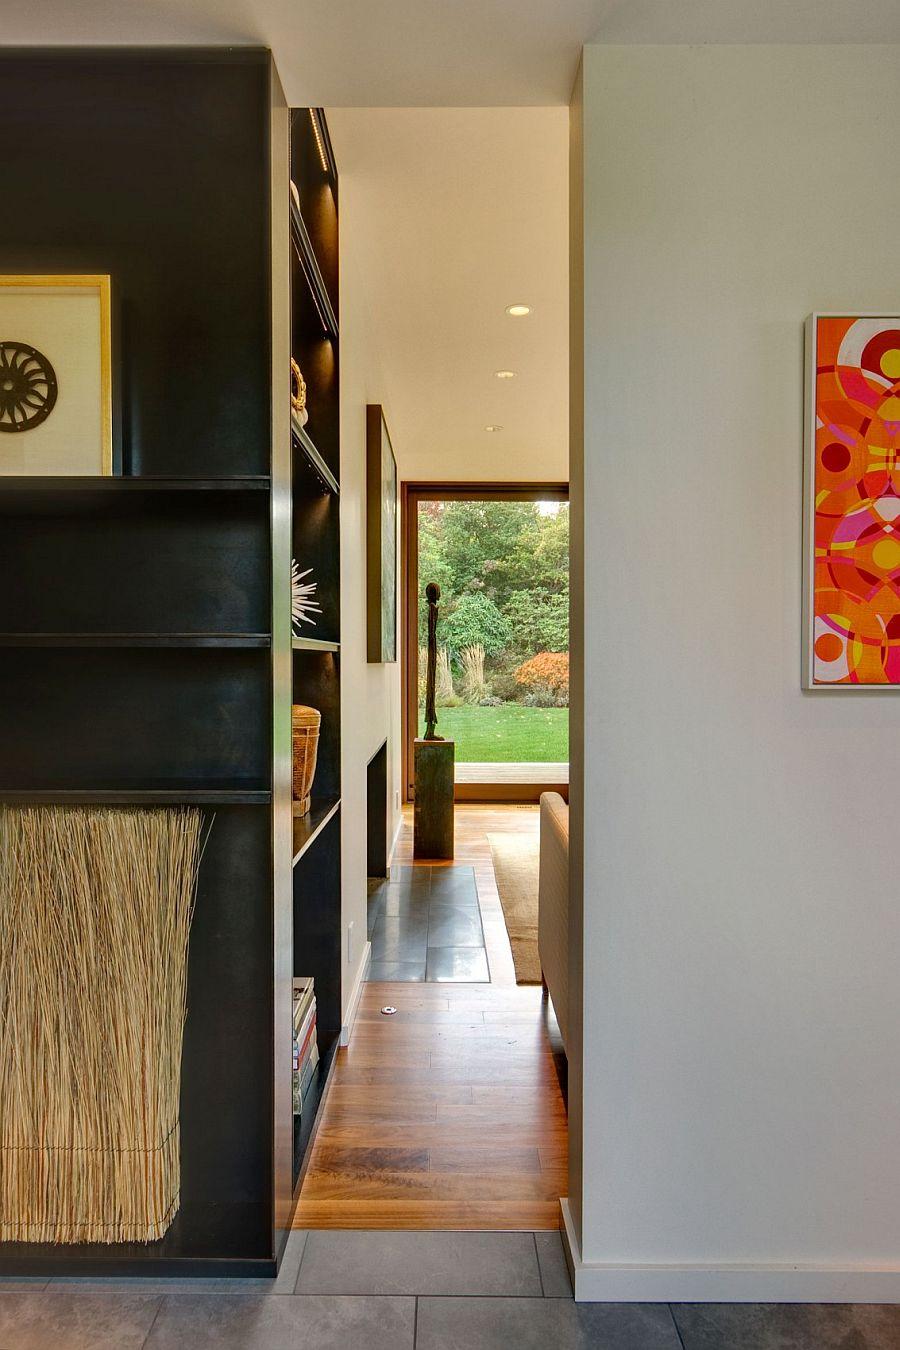 Floor tiles demarcate space inside the house